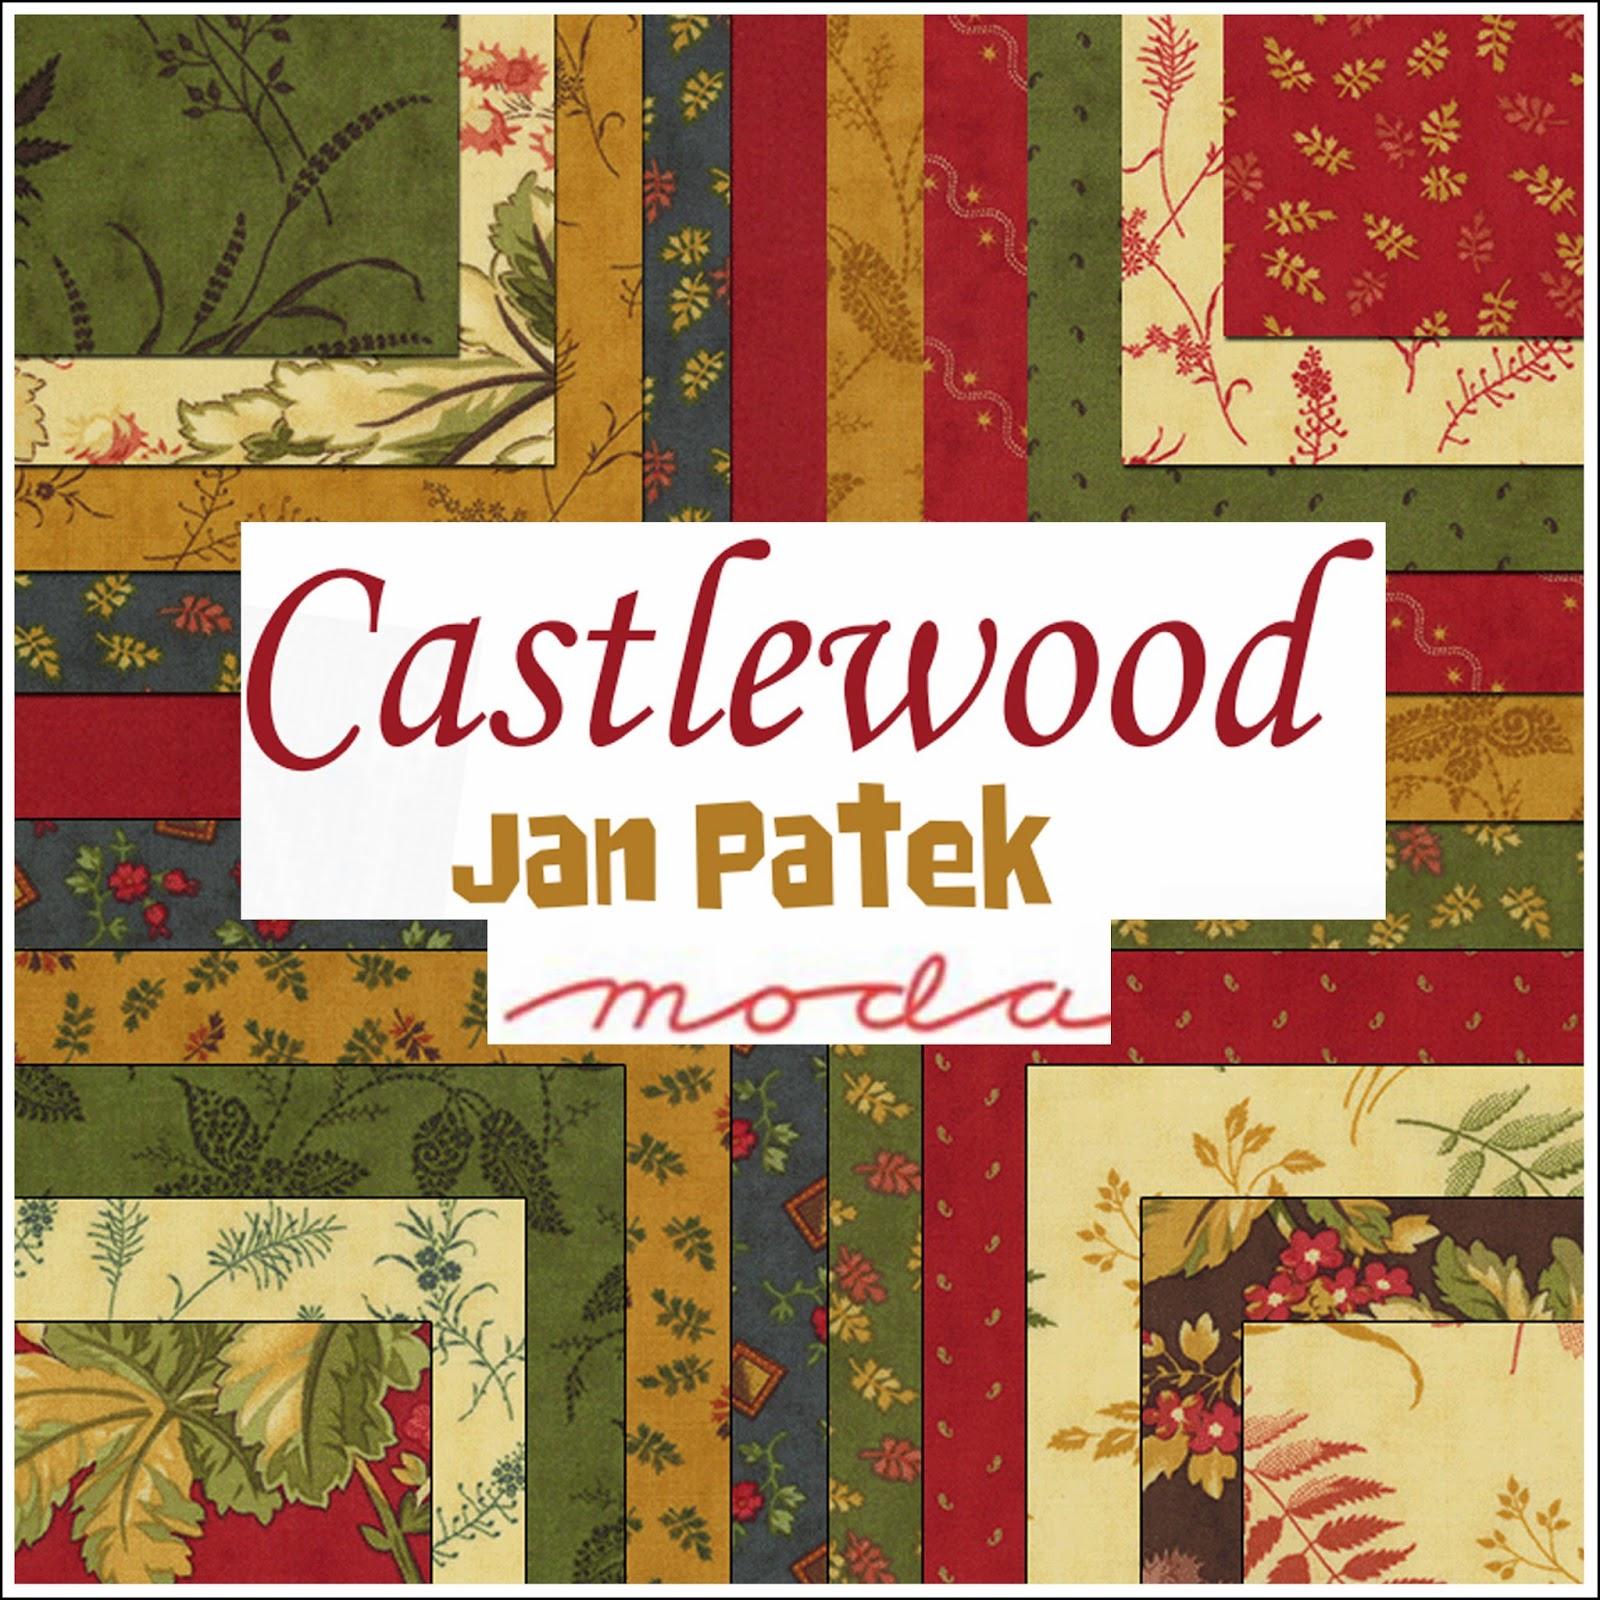 Moda Castlewood Quilt Fabric By Jan Patek For Moda Fabrics